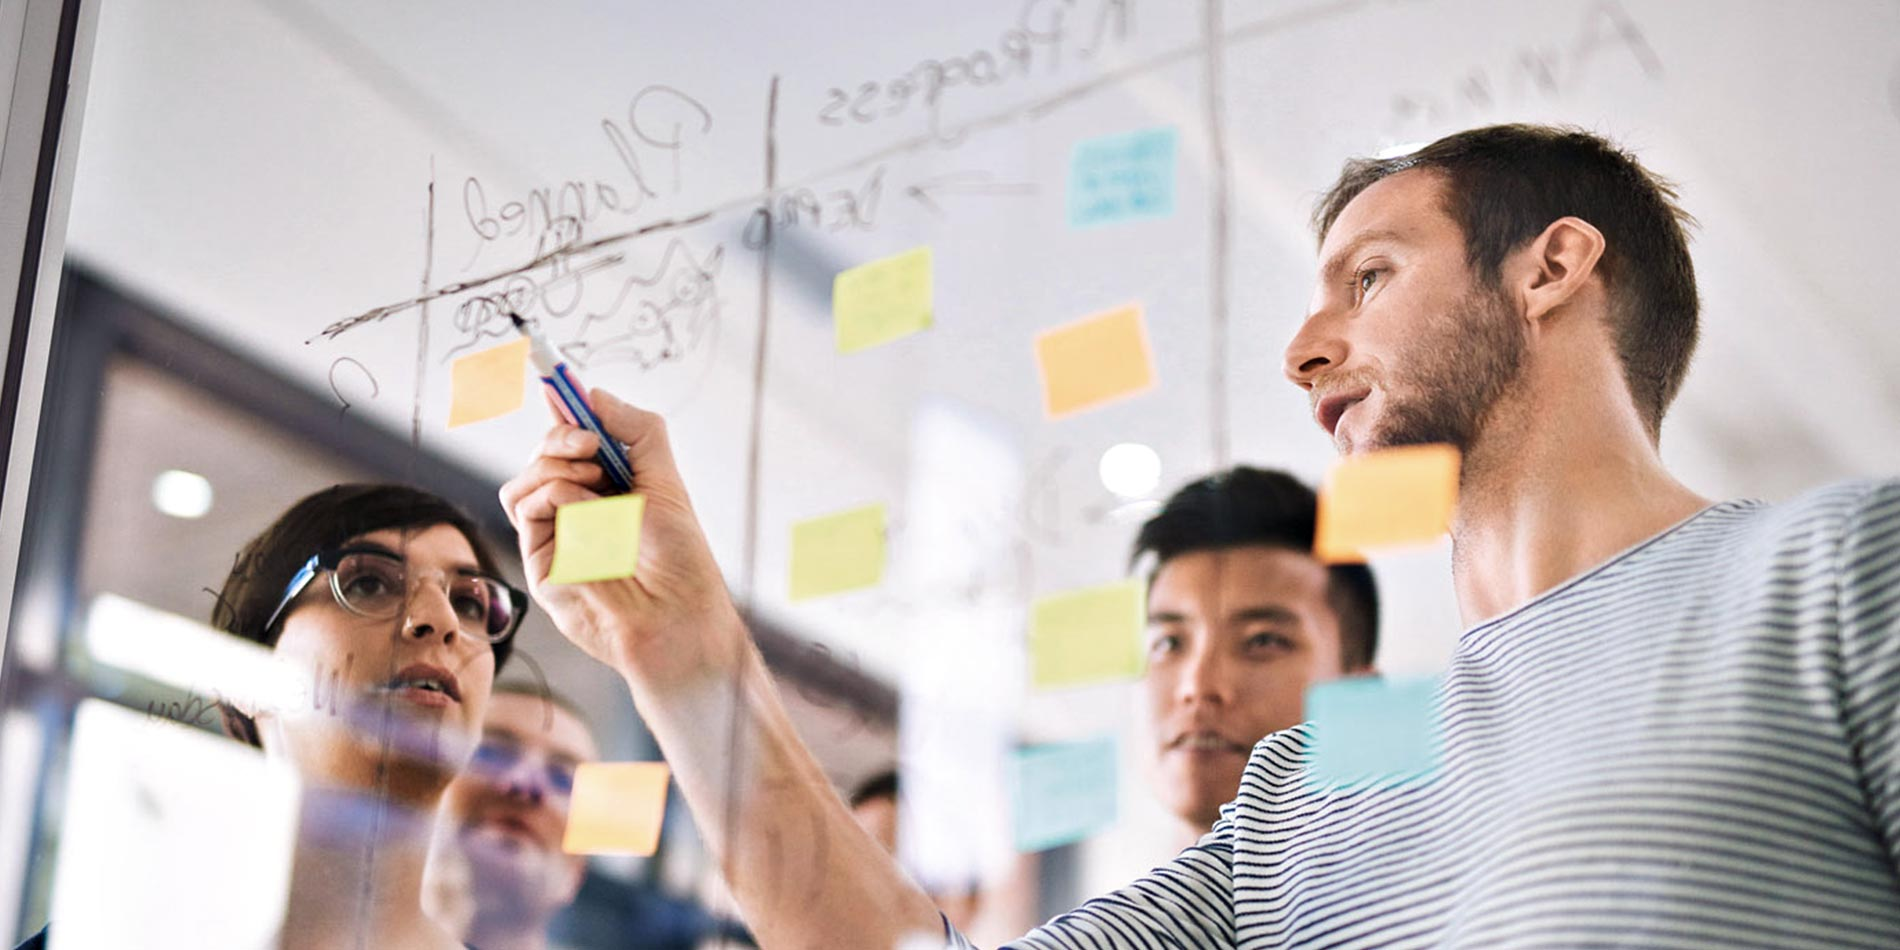 Agiles Arbeiten bei Strategy & Consulting